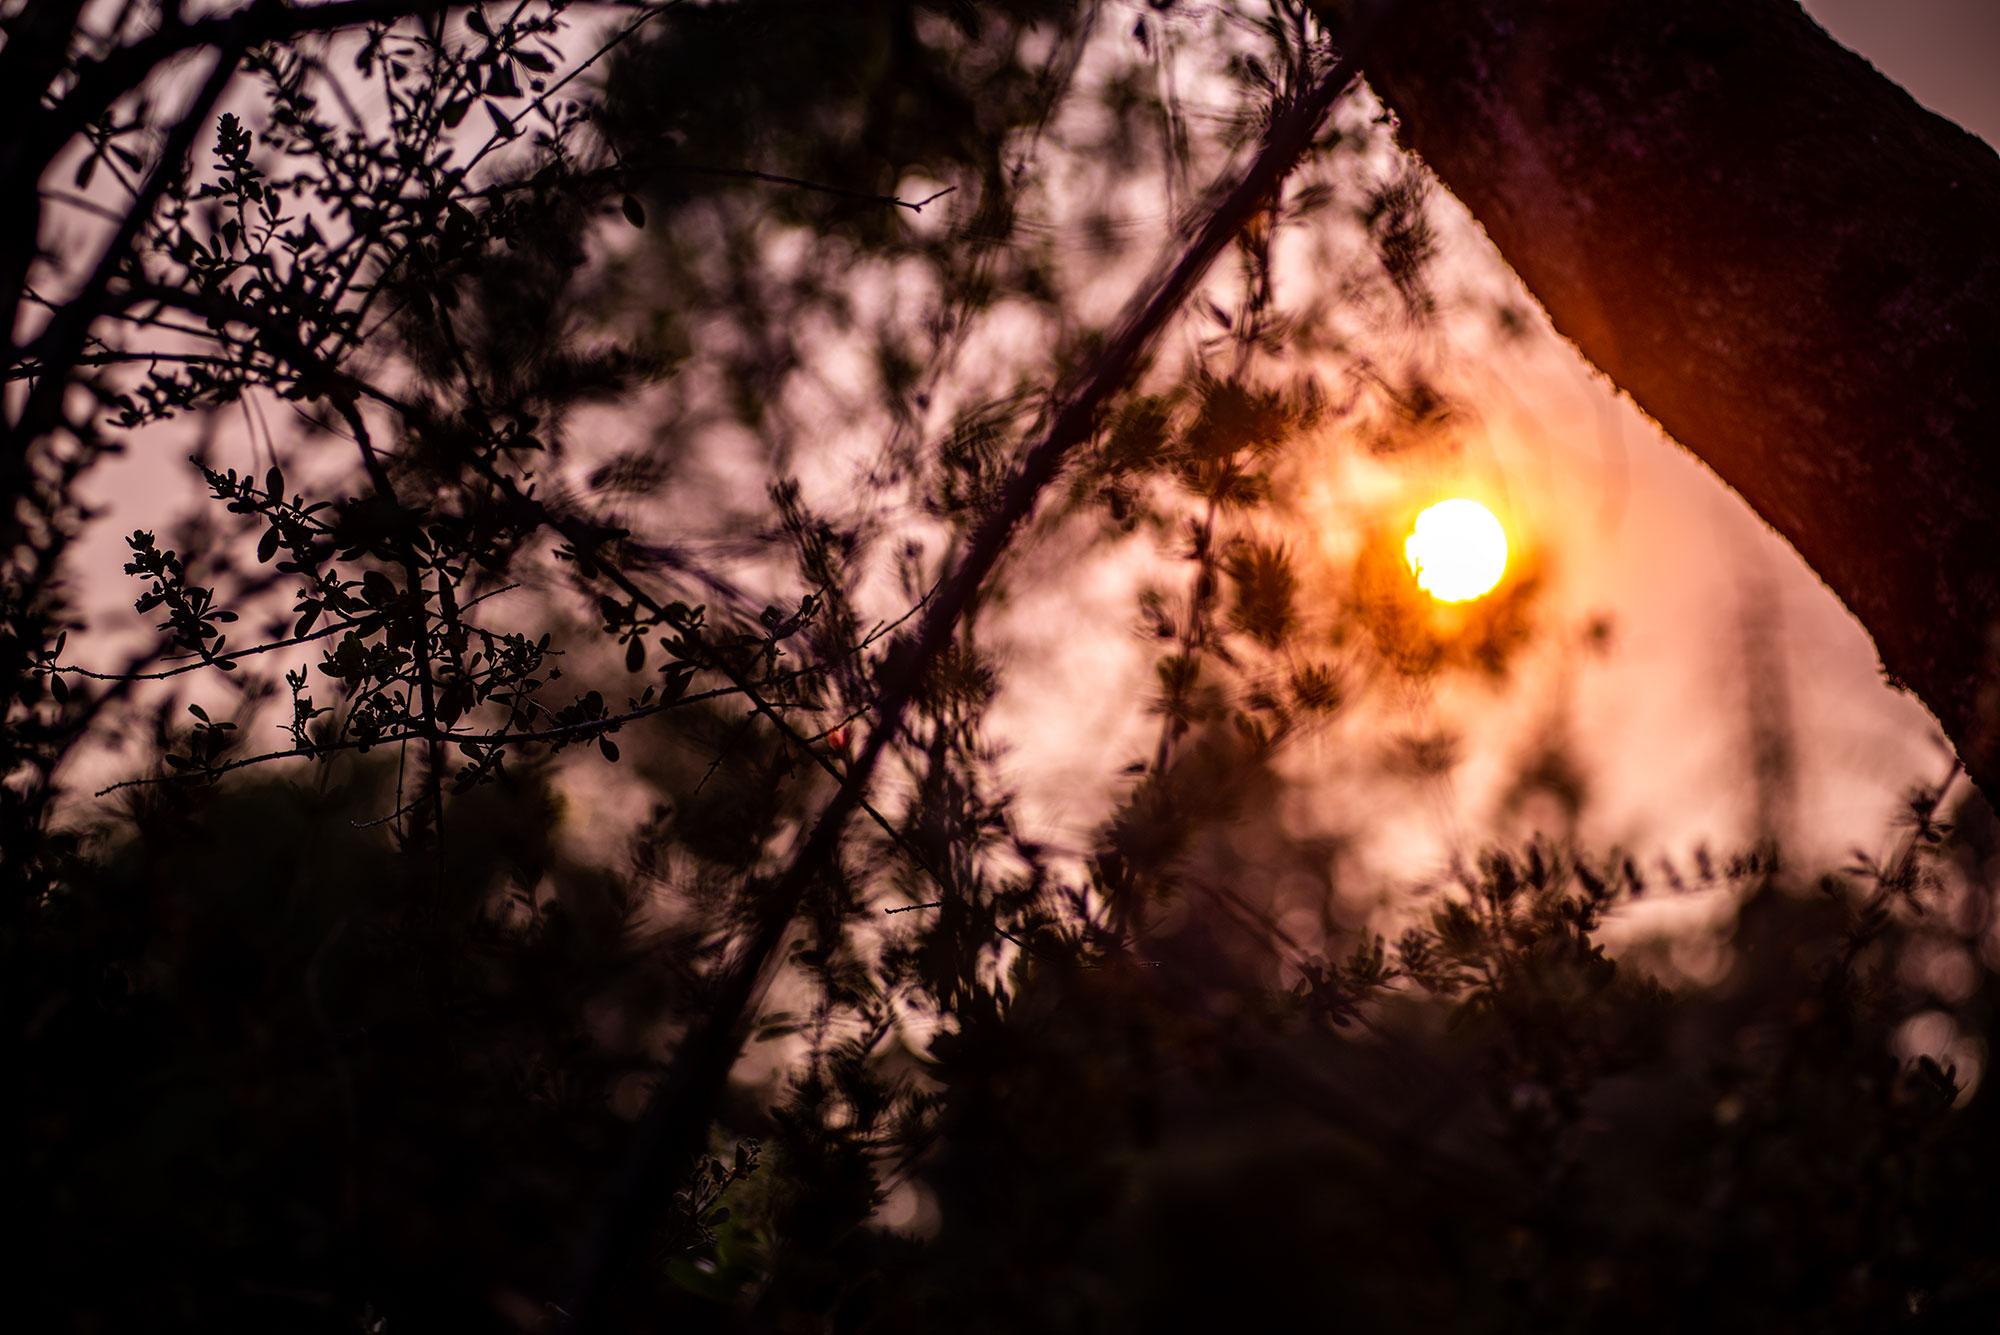 Sunset photography at in California near Yosemite National Park taken by landscape photographer Jennifer Esseiva.